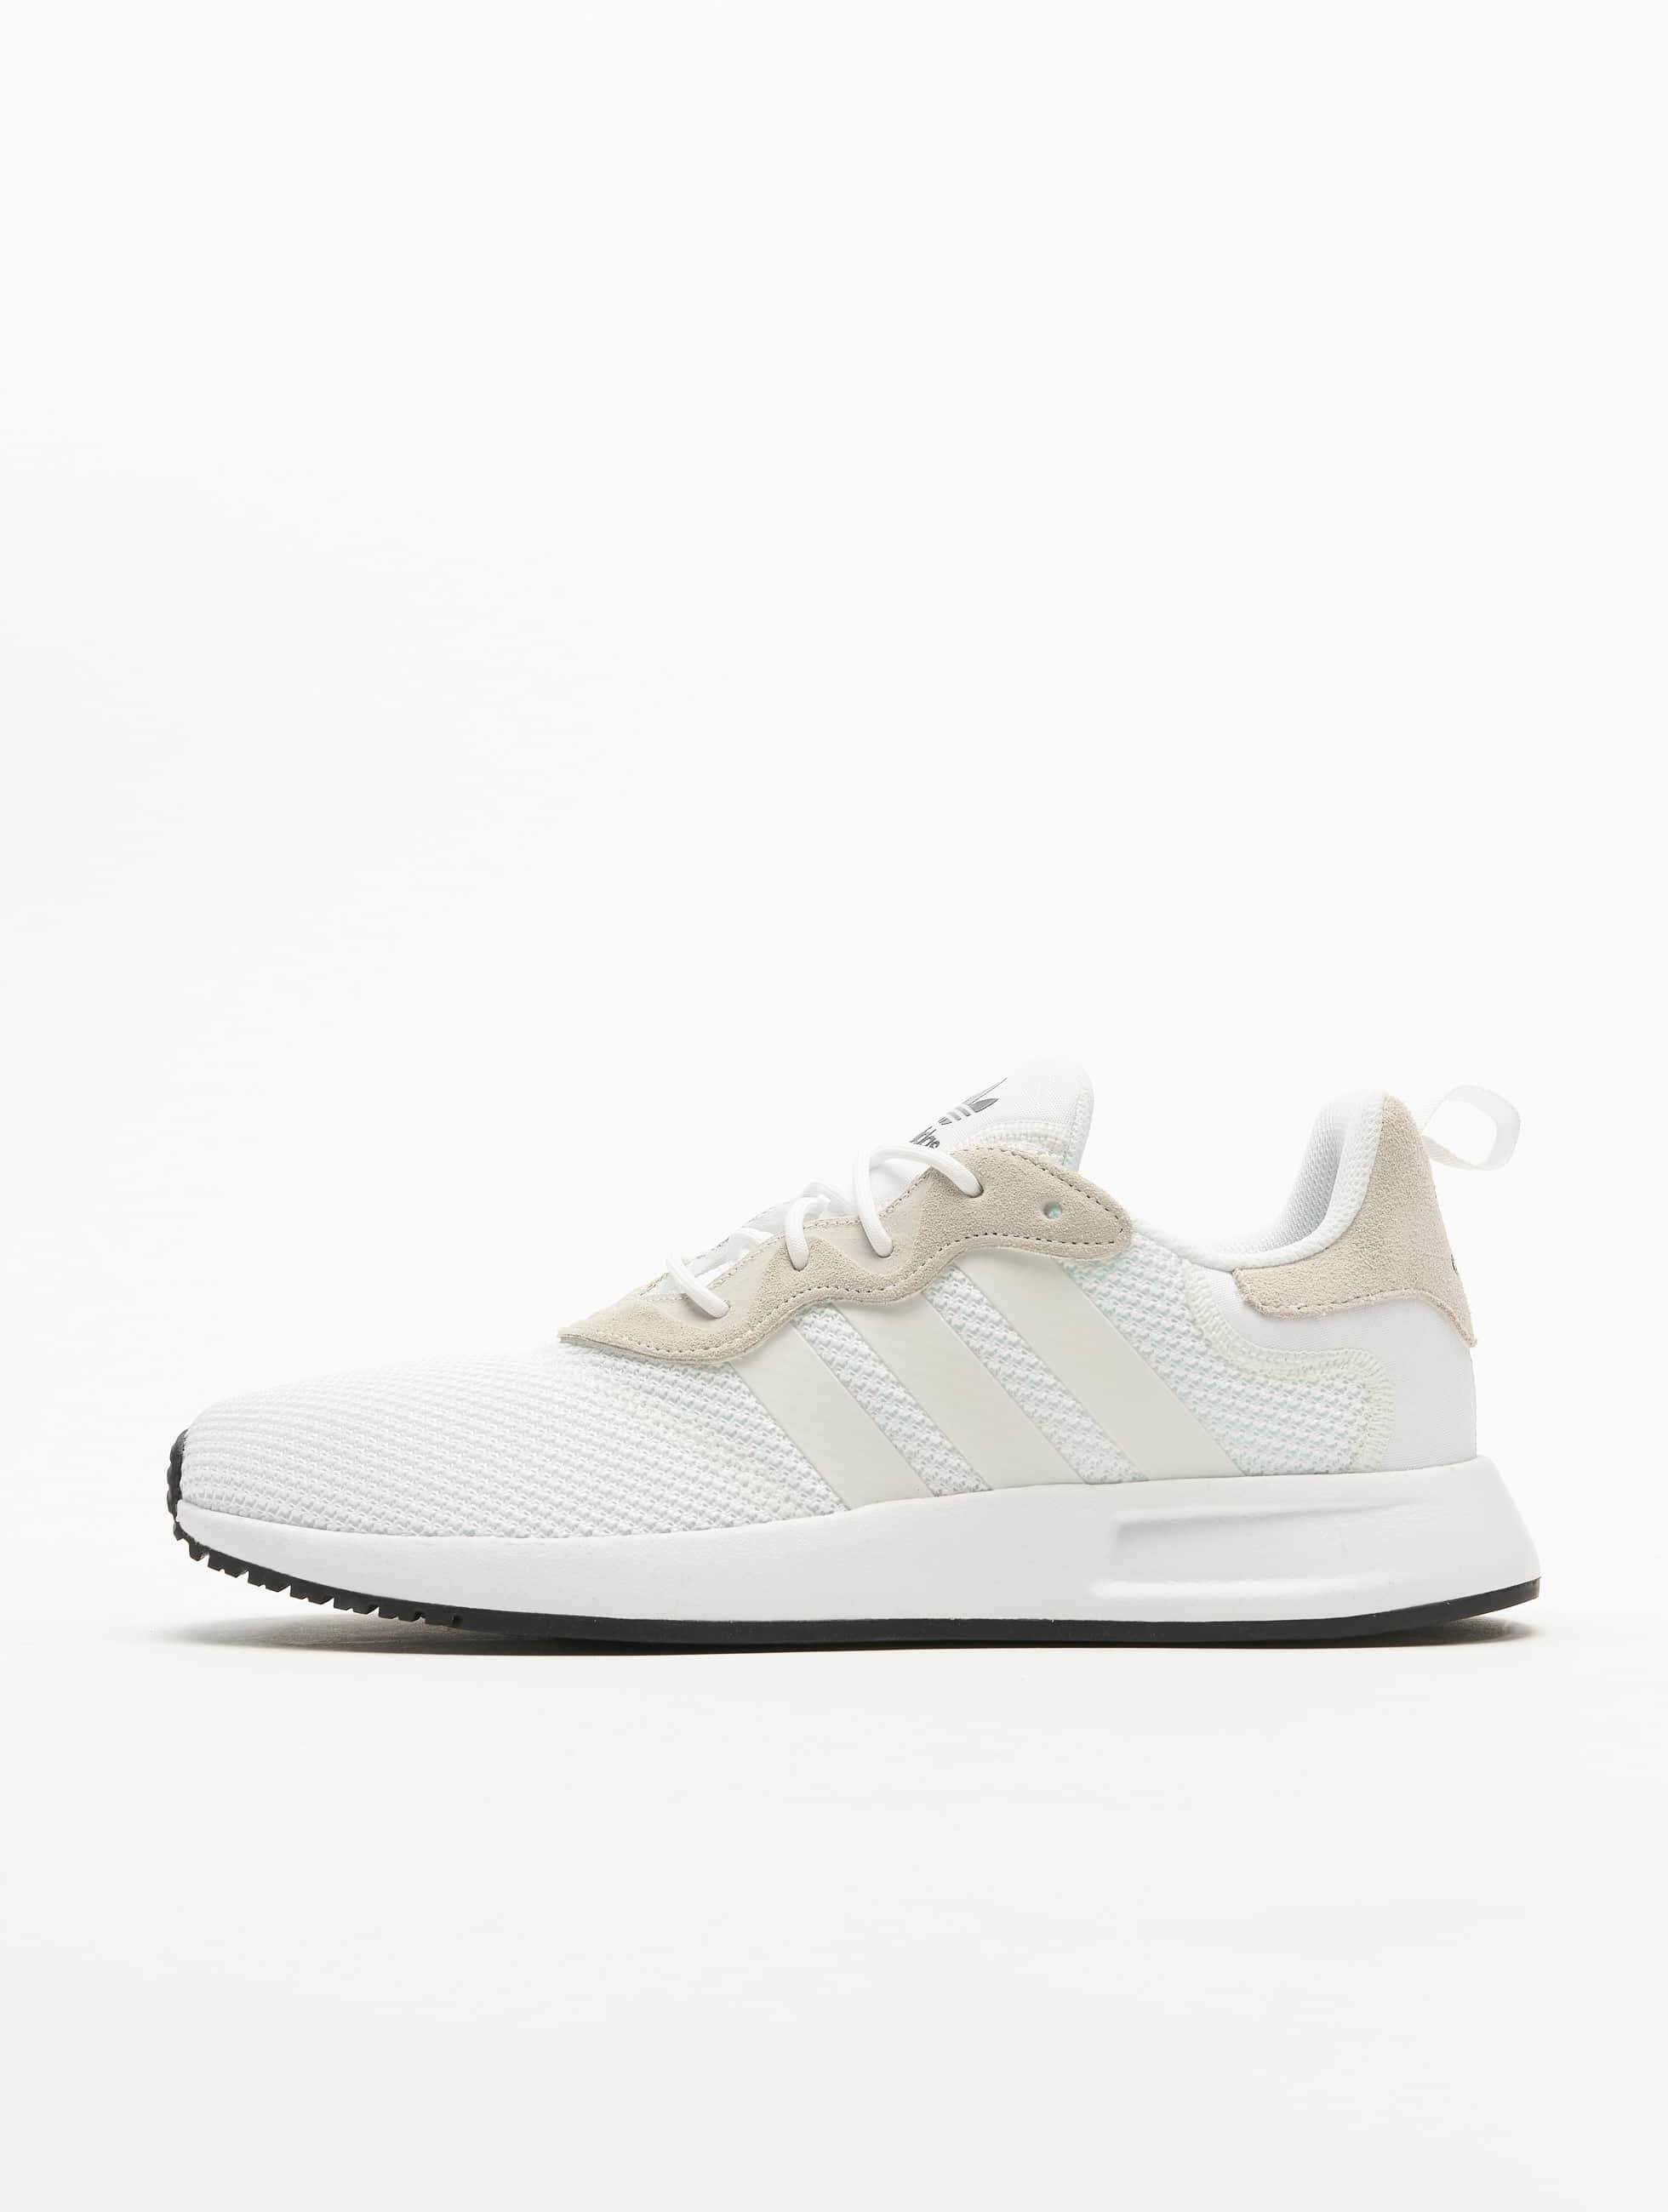 Adidas Originals X_PLR S Sneakers Ftwr WhiteFtwr WhiteCore Black